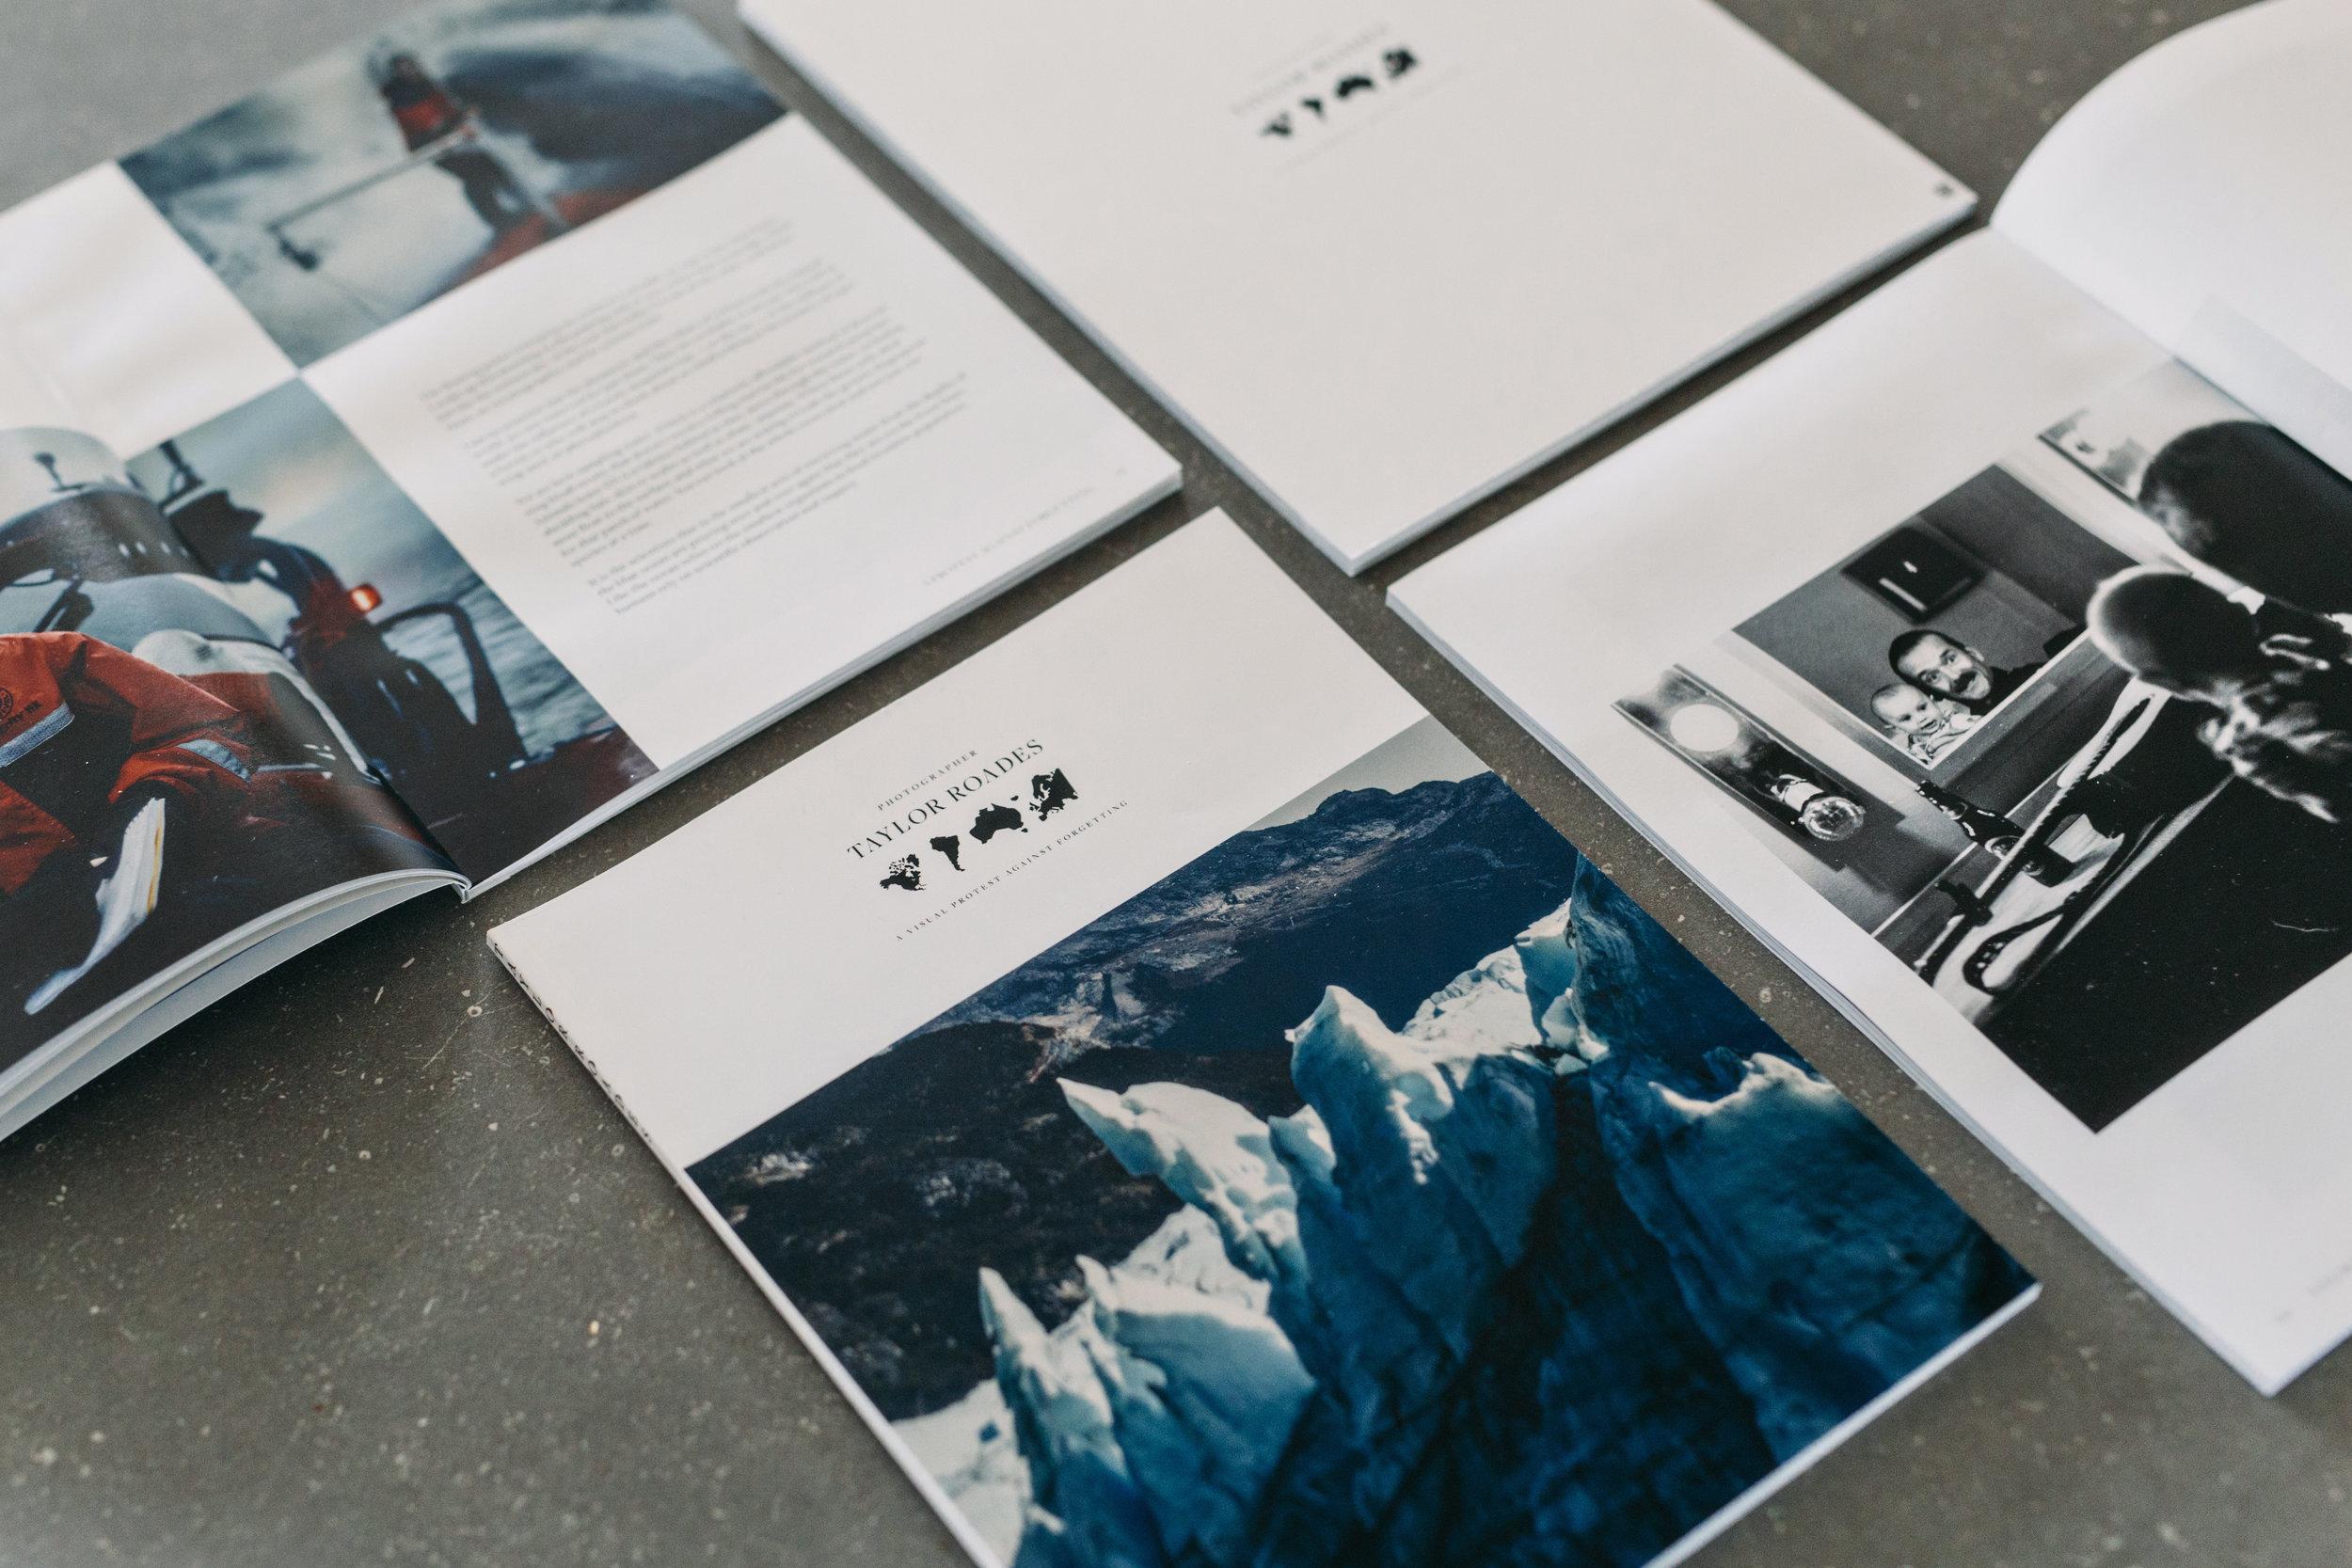 Promo-Books-Photos-TaylorRoades-0032.JPG